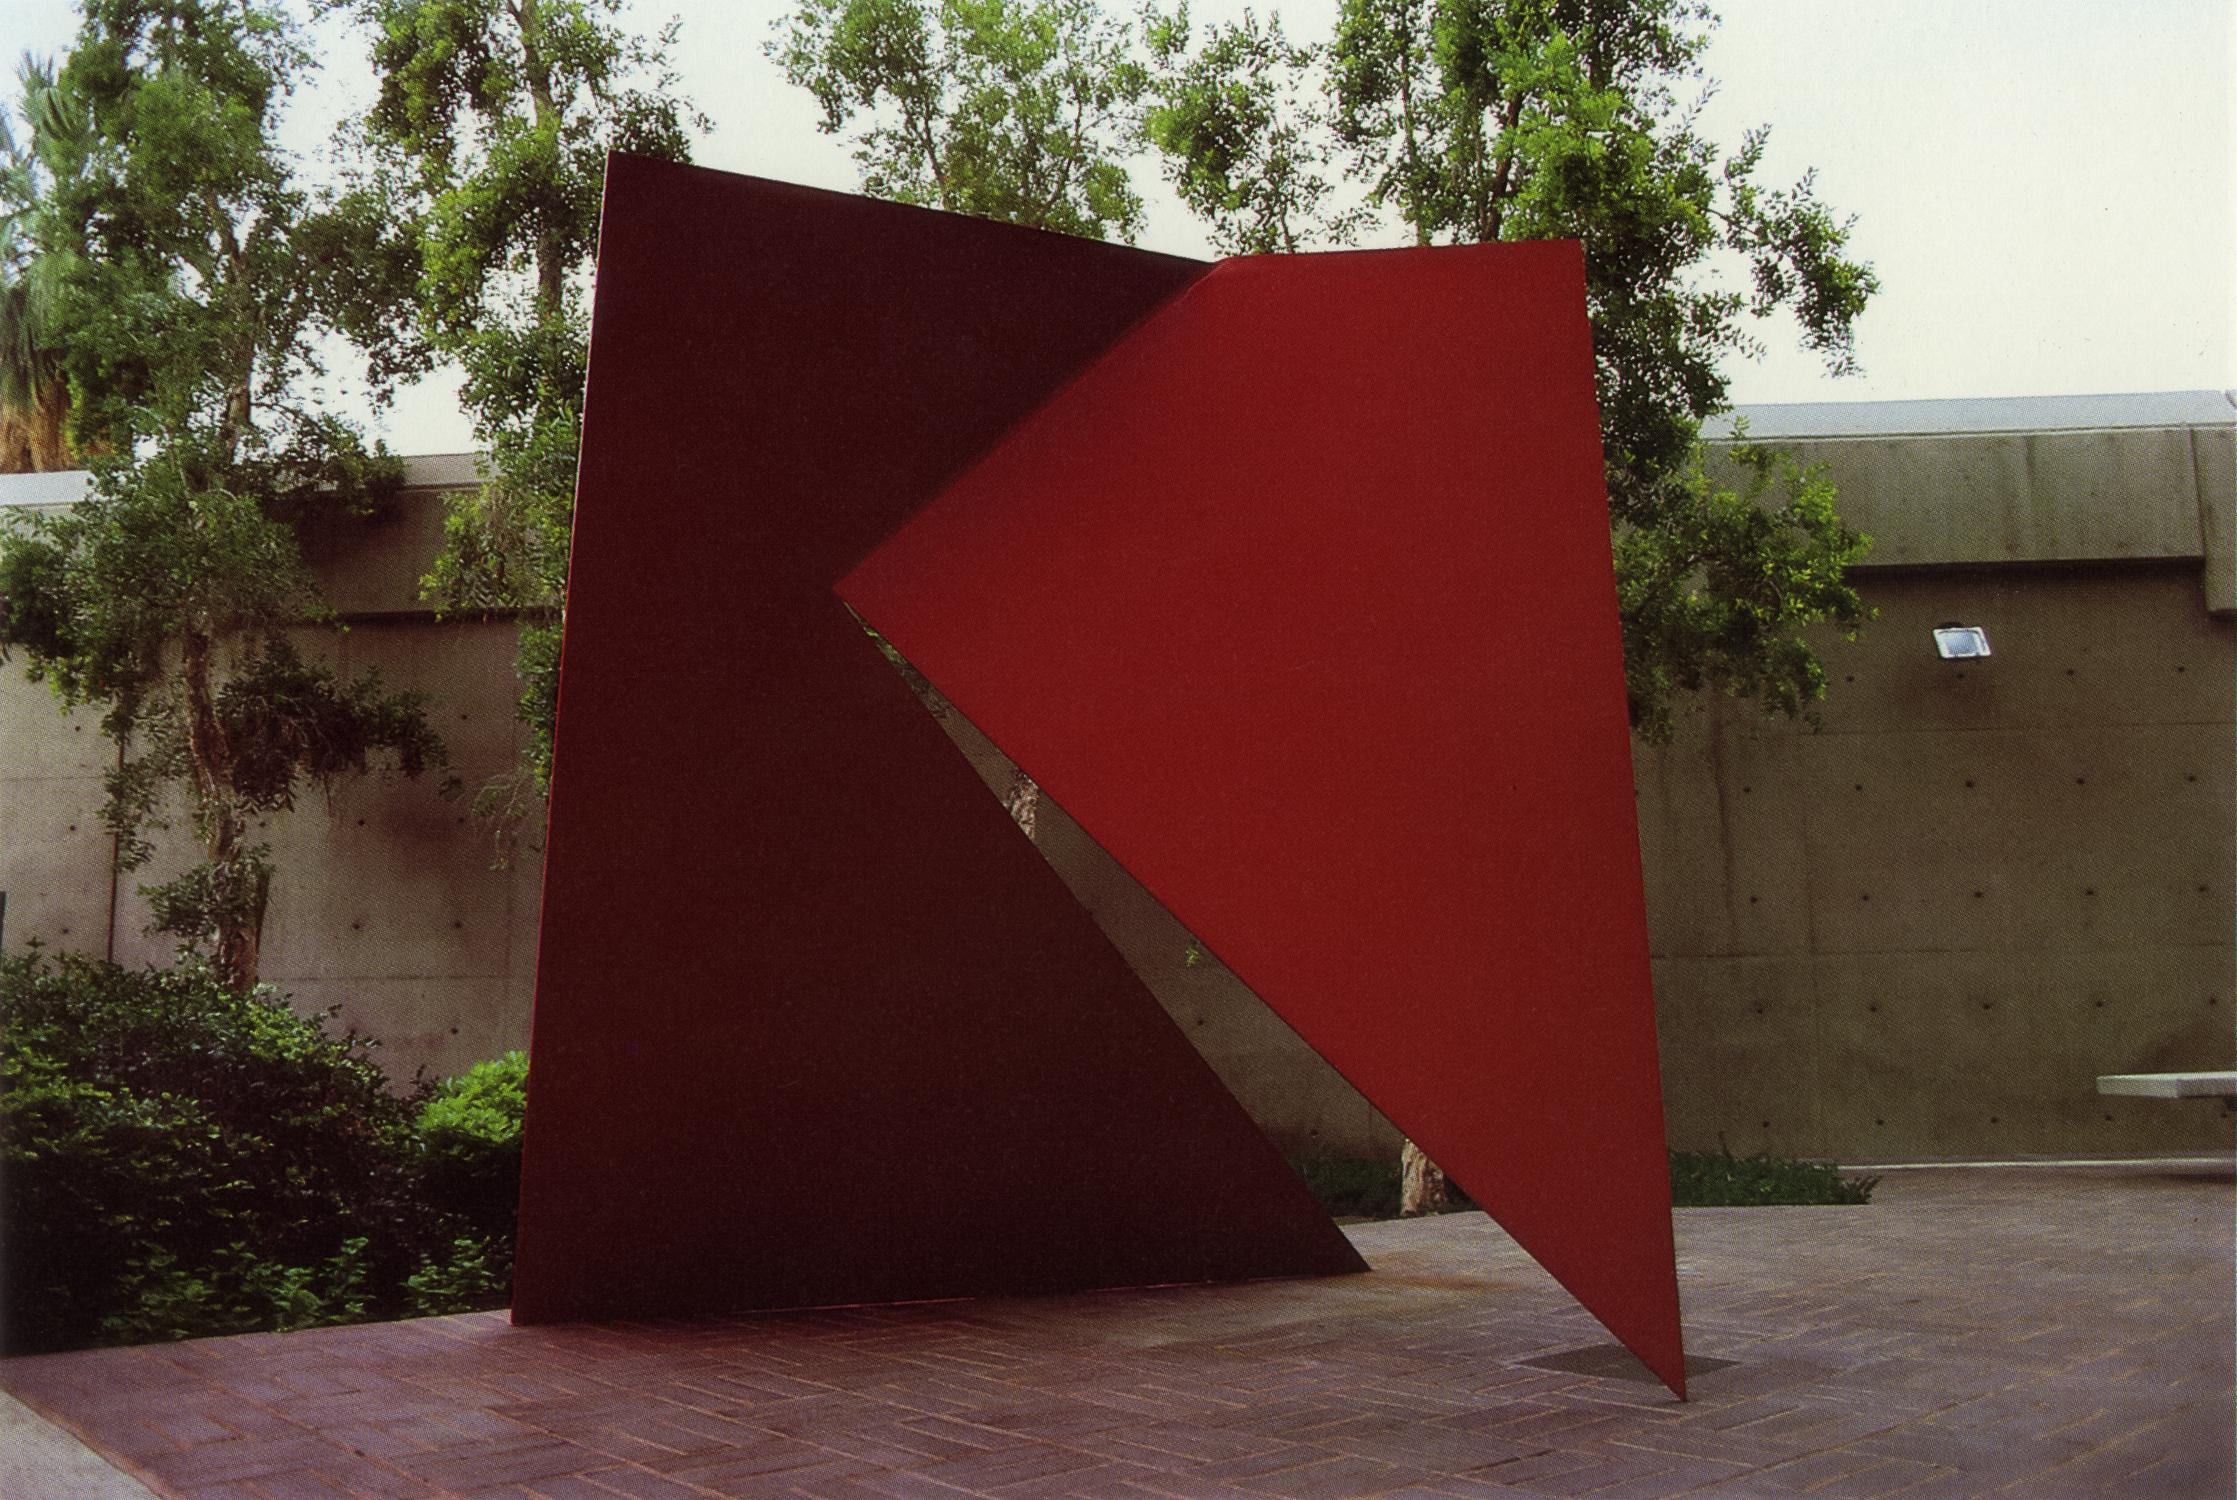 Palm Springs Desert Museum, Palm Springs, California; 1982.  M.H. XIV.  8.5' x 8' x 8'.